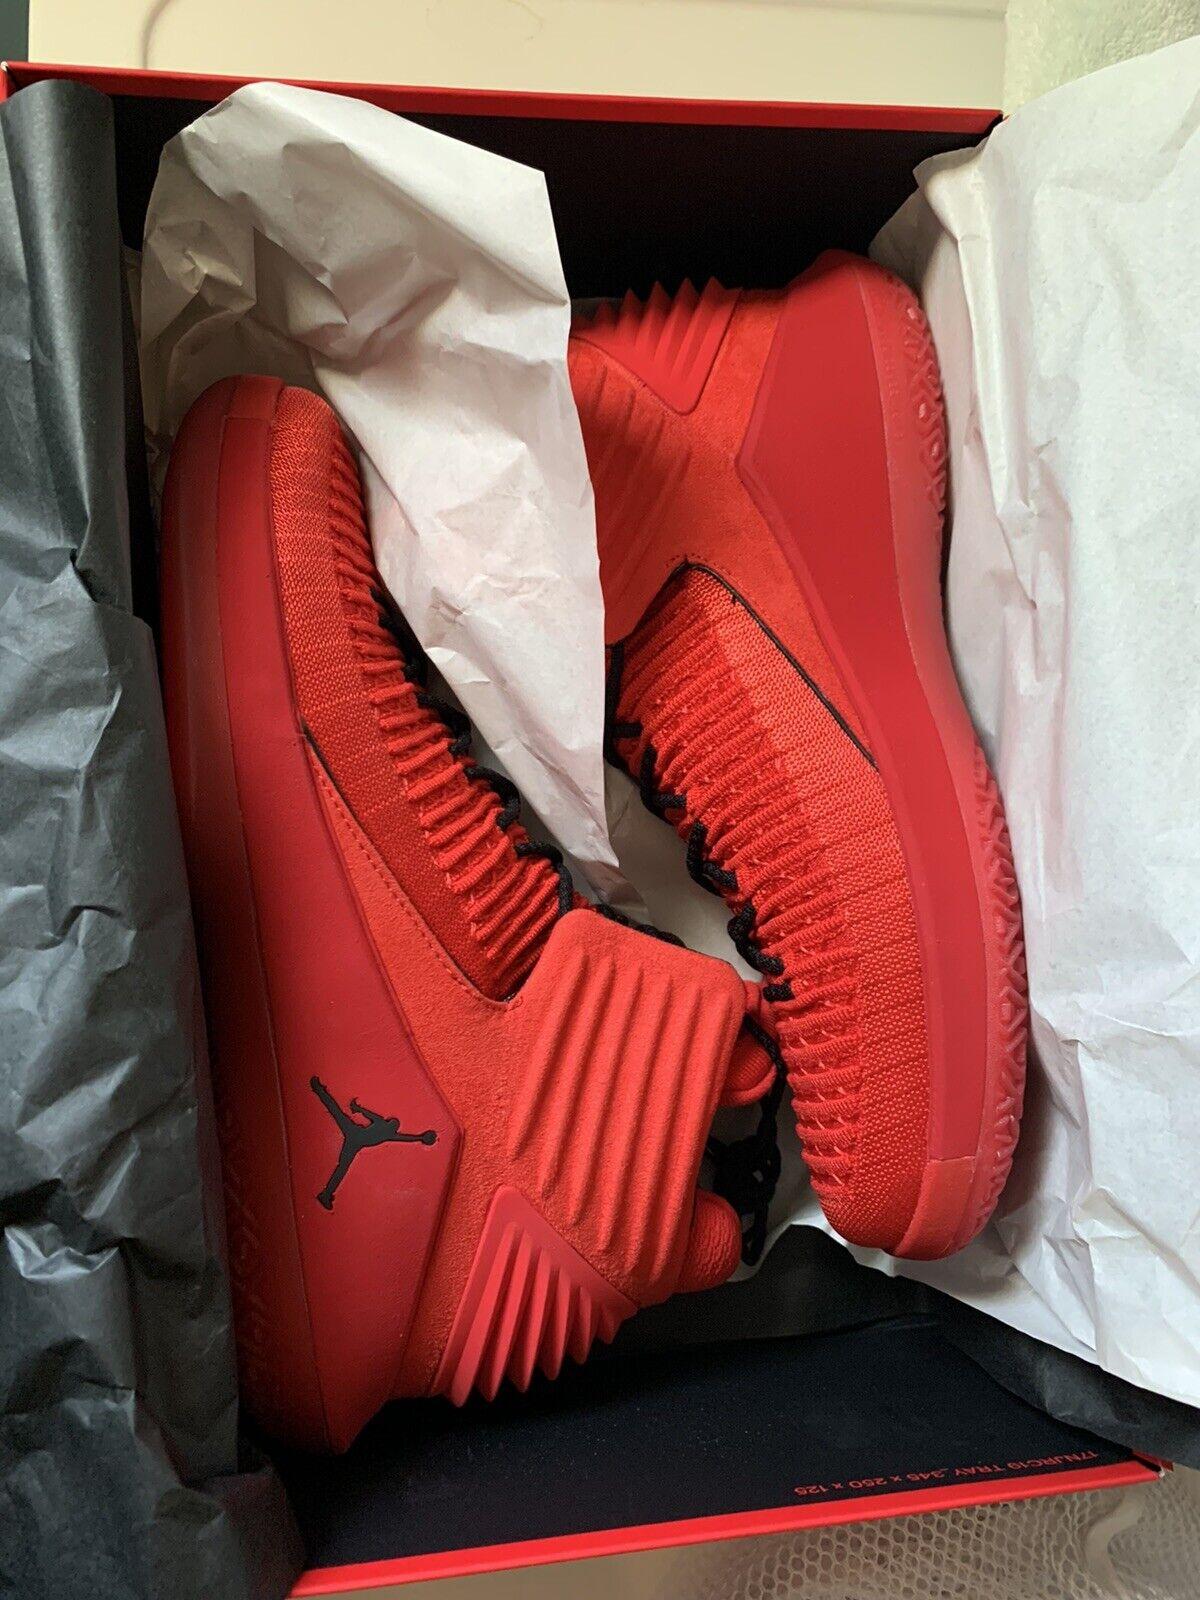 NIKE Air Jordan XXXII Size 9.5 for sale